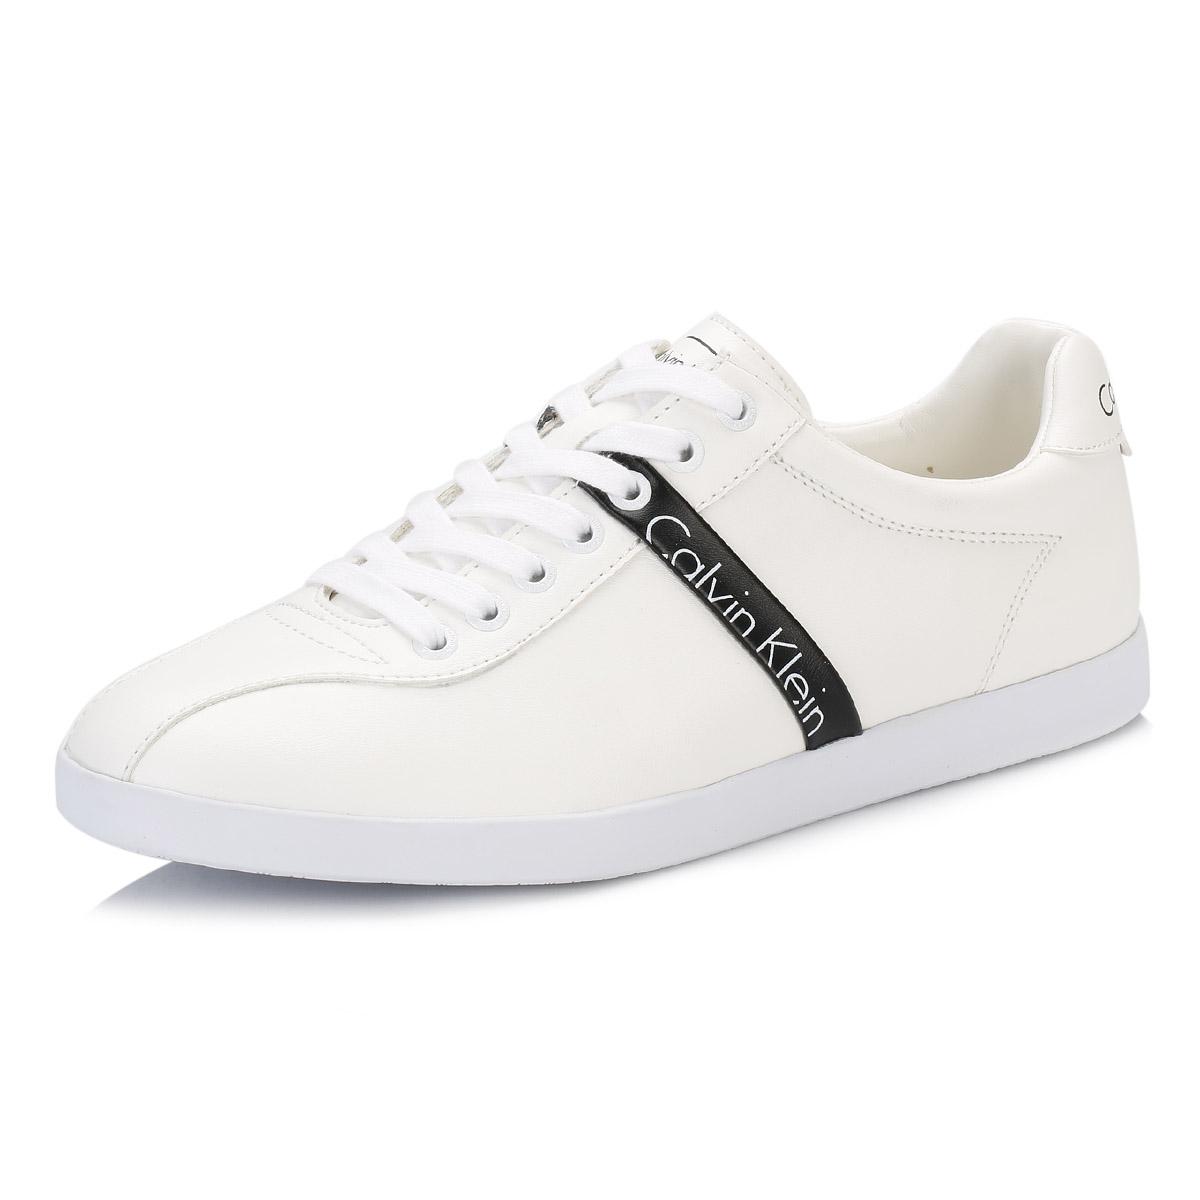 calvin klein ck mens trainers white black avi casual shoes